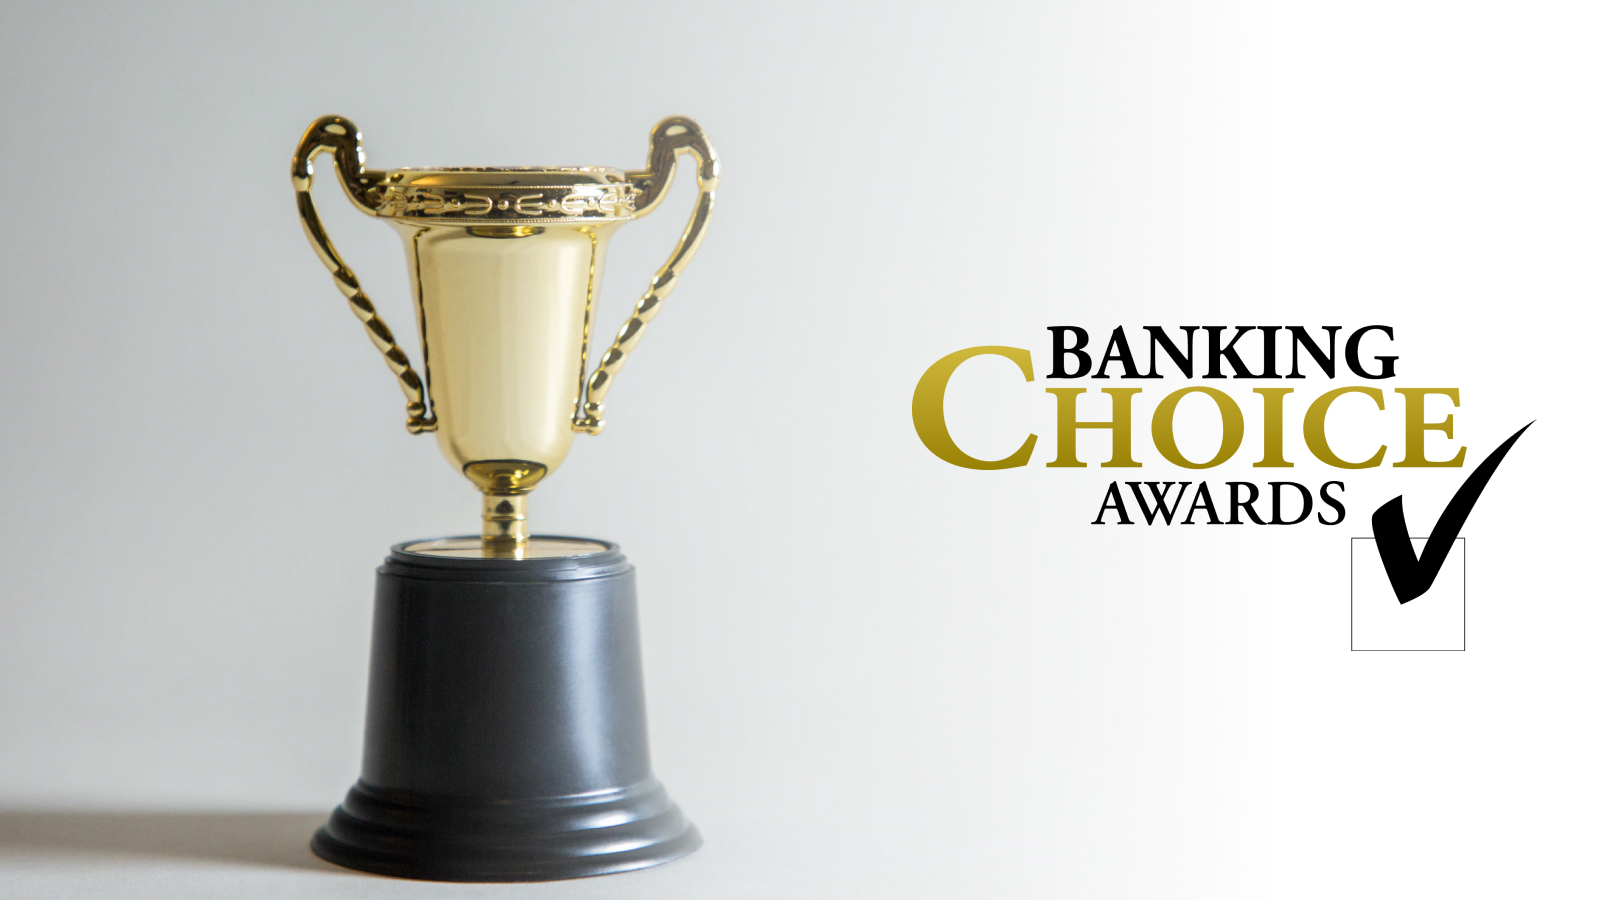 Banking choice awards logo